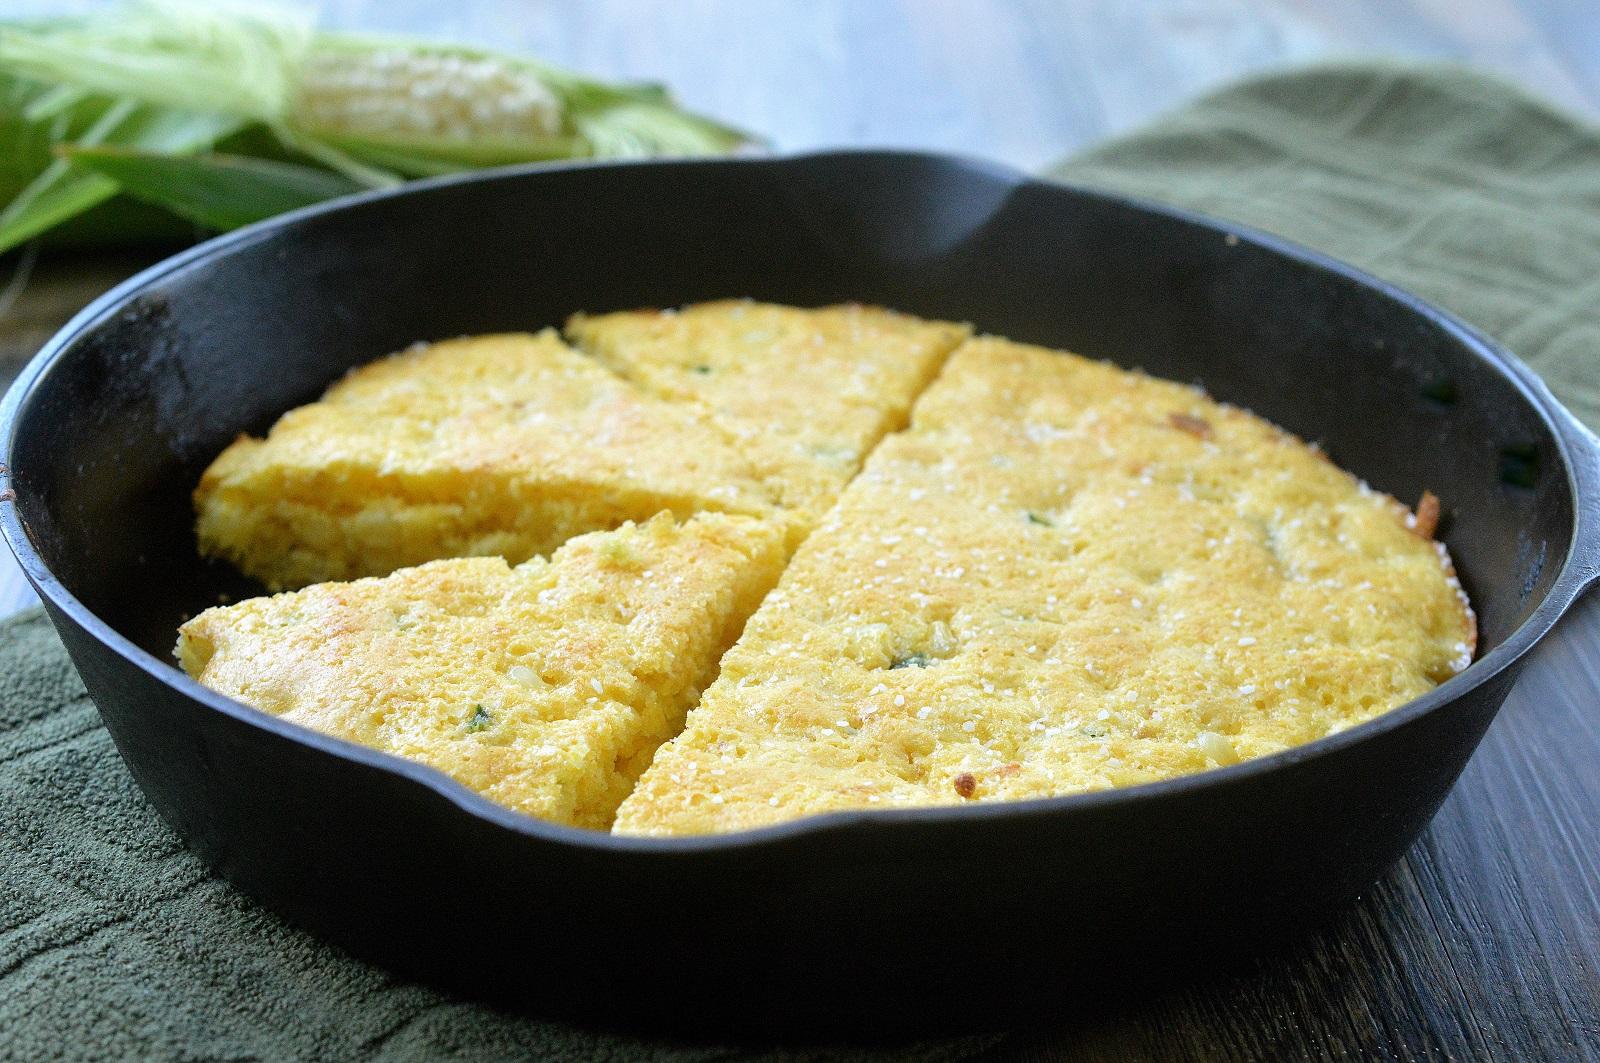 Oprah's Skinny Cornbread Recipe